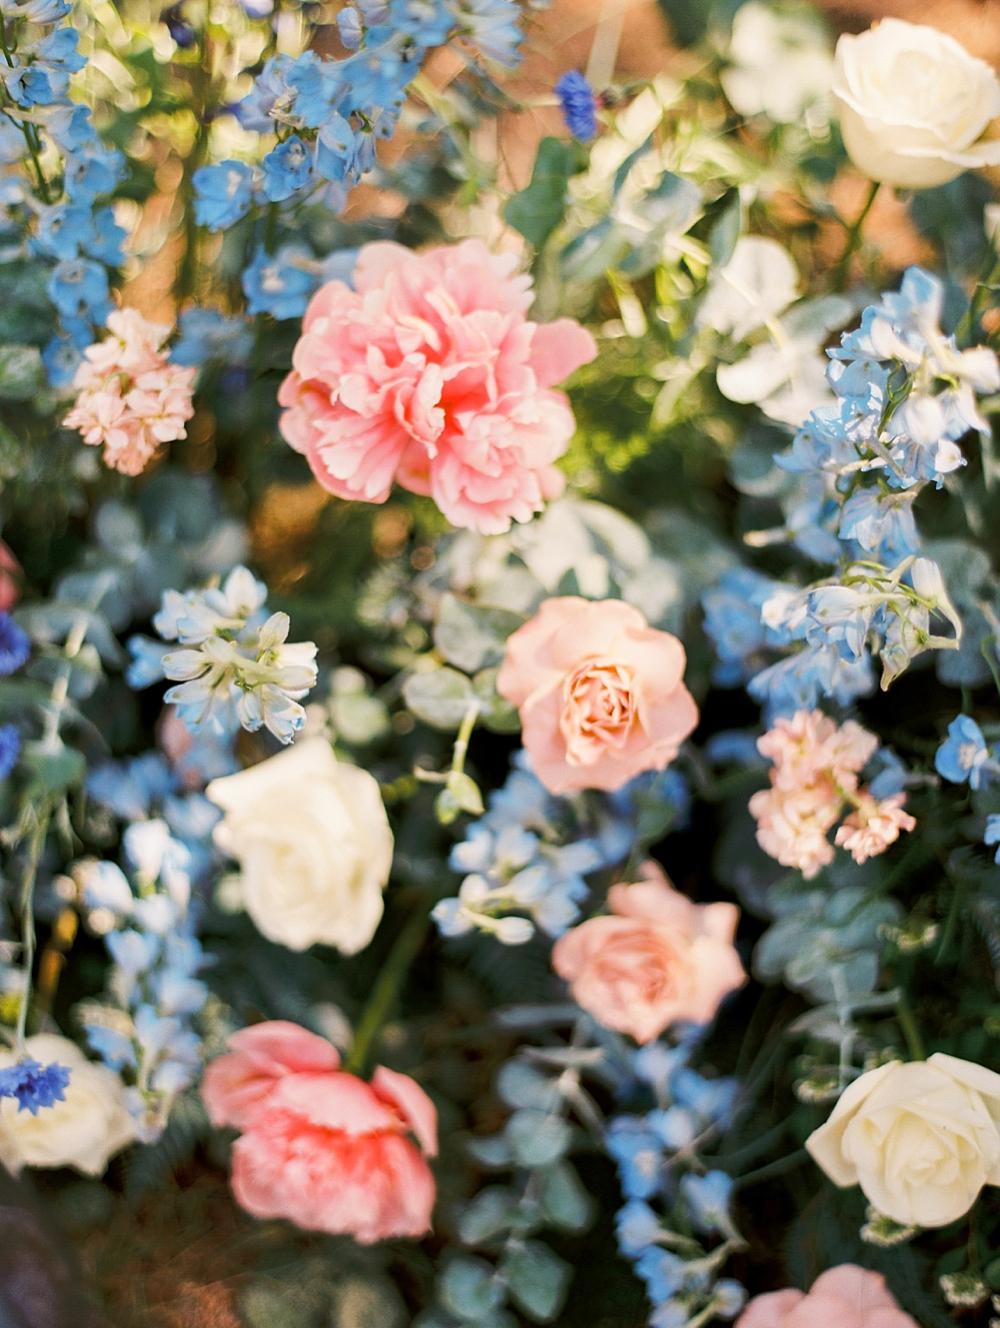 Kristin-La-Voie-Photography-Austin-Wedding-Photographer-the-grand-lady-64